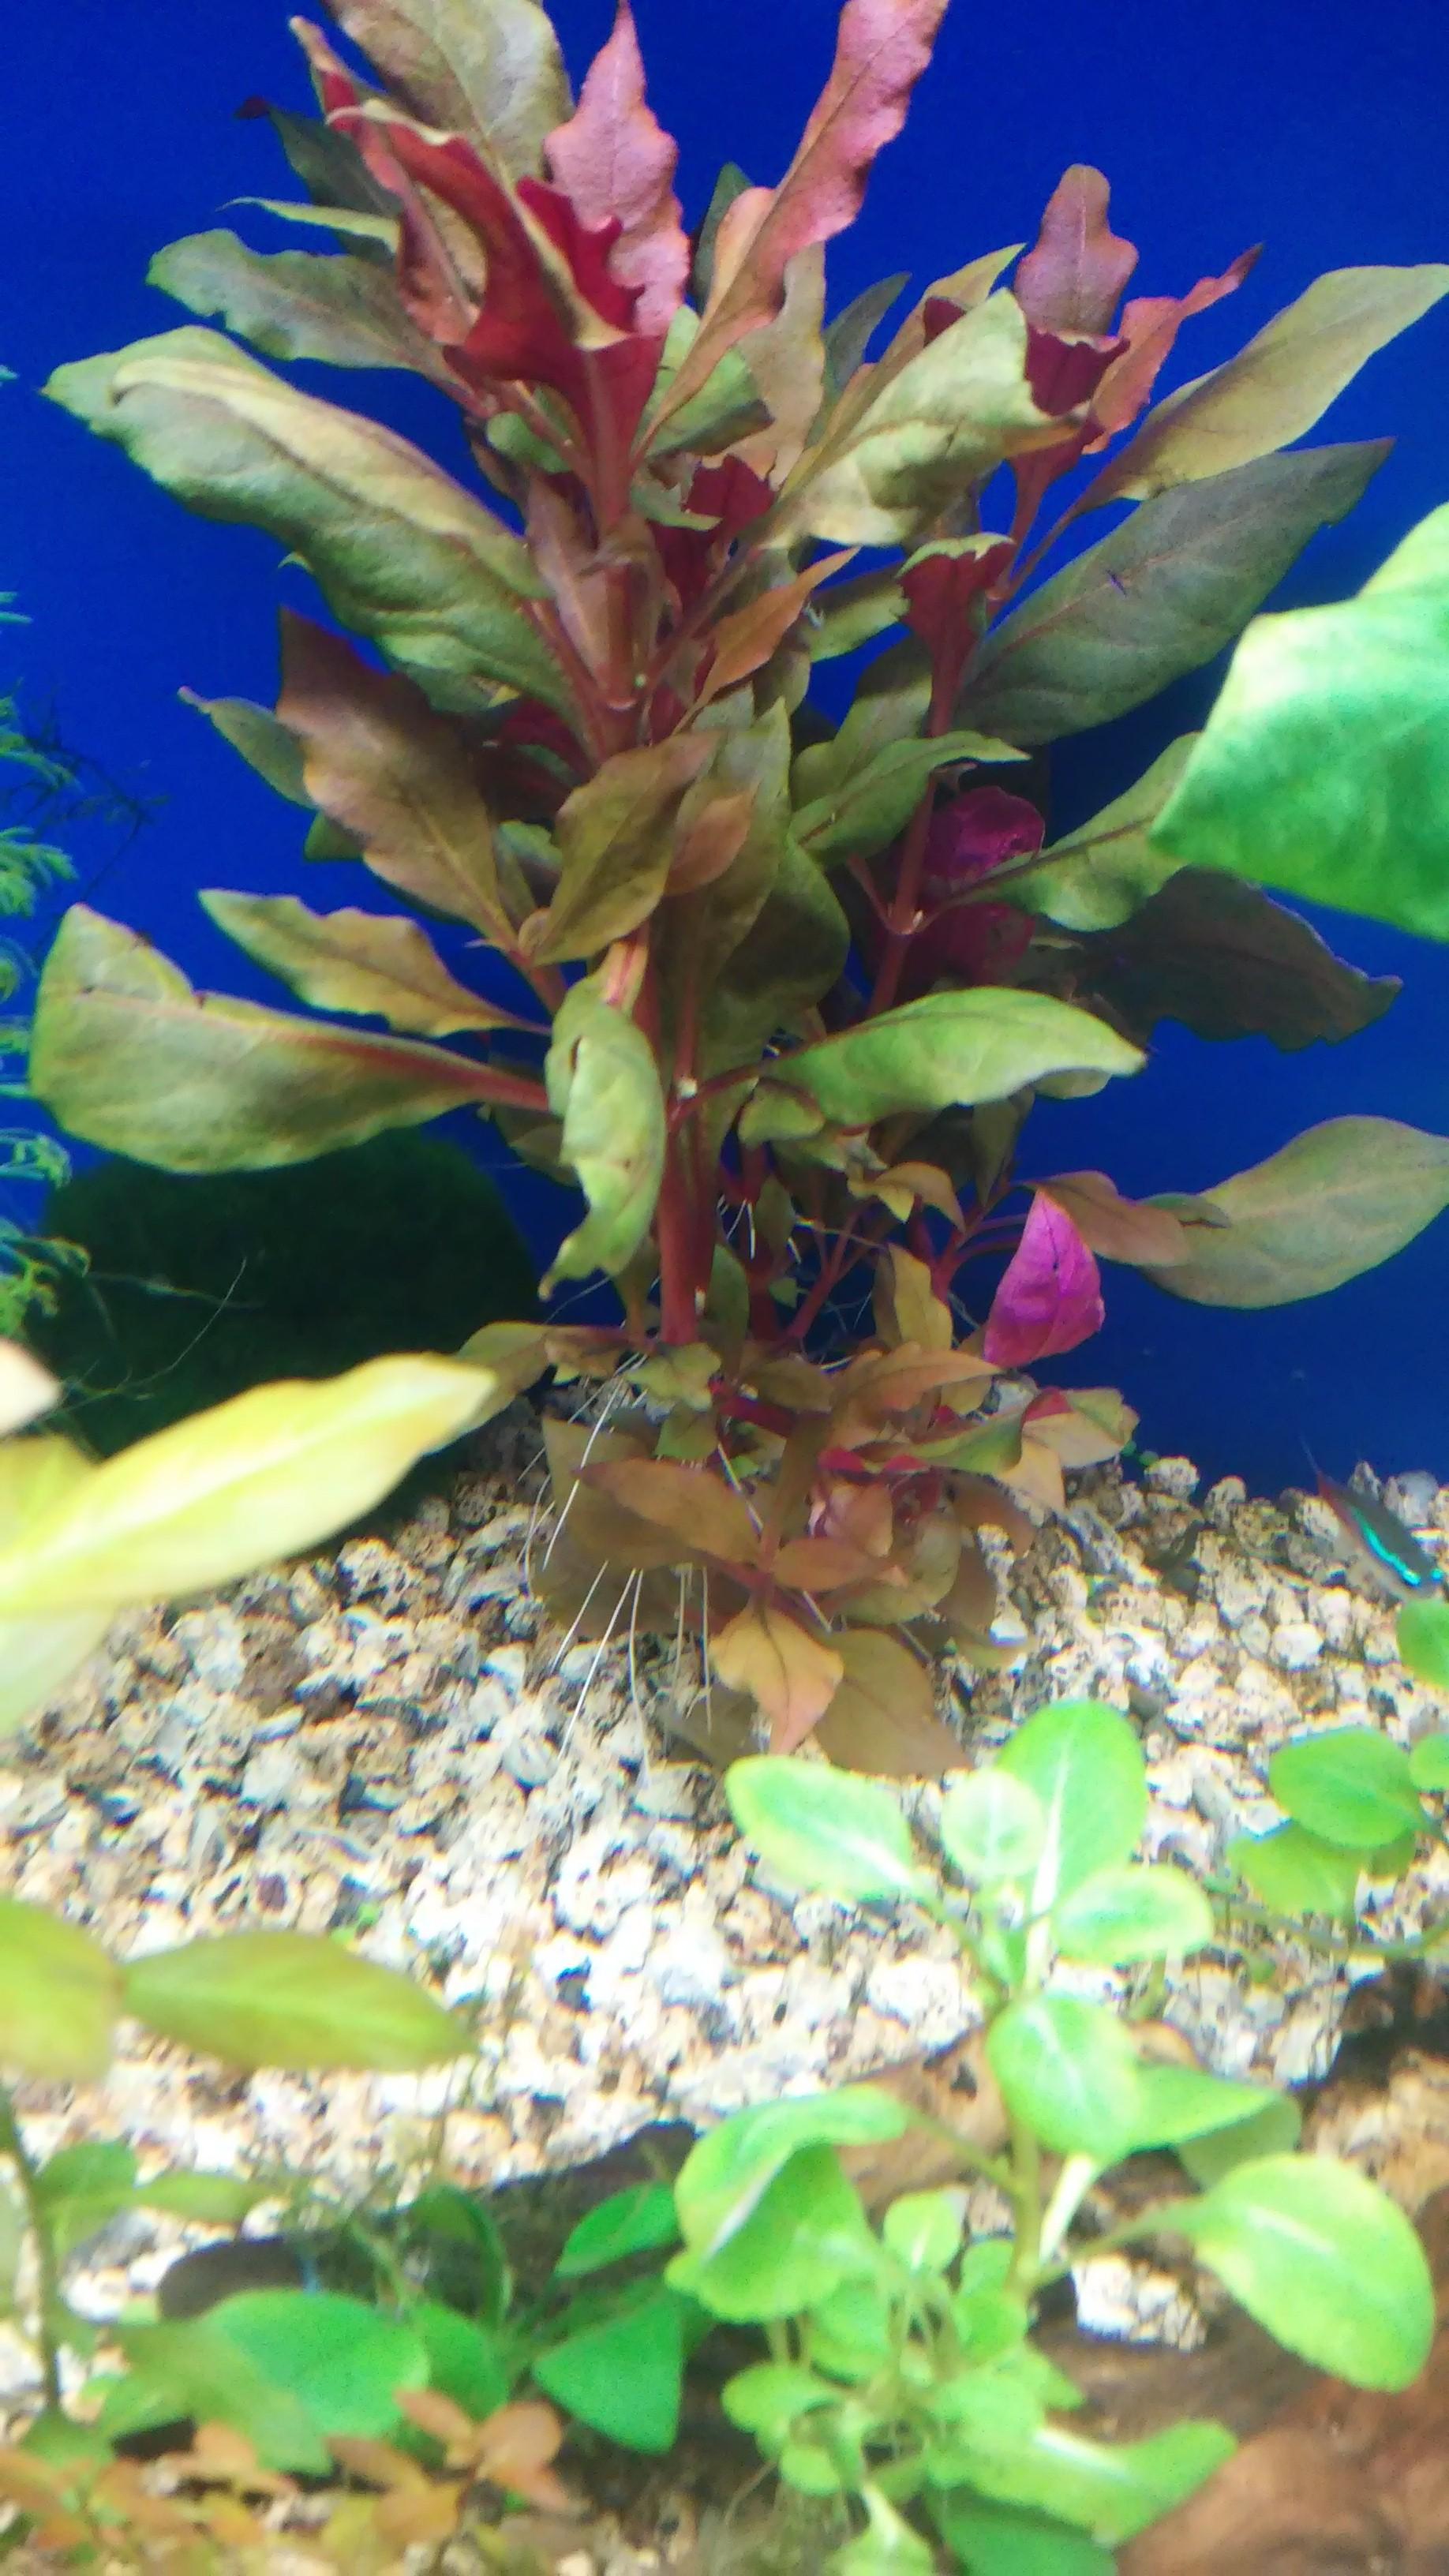 Pianta Foglie Rosse E Verdi alternanthera reineckii rosaefolia (del mio acquario)